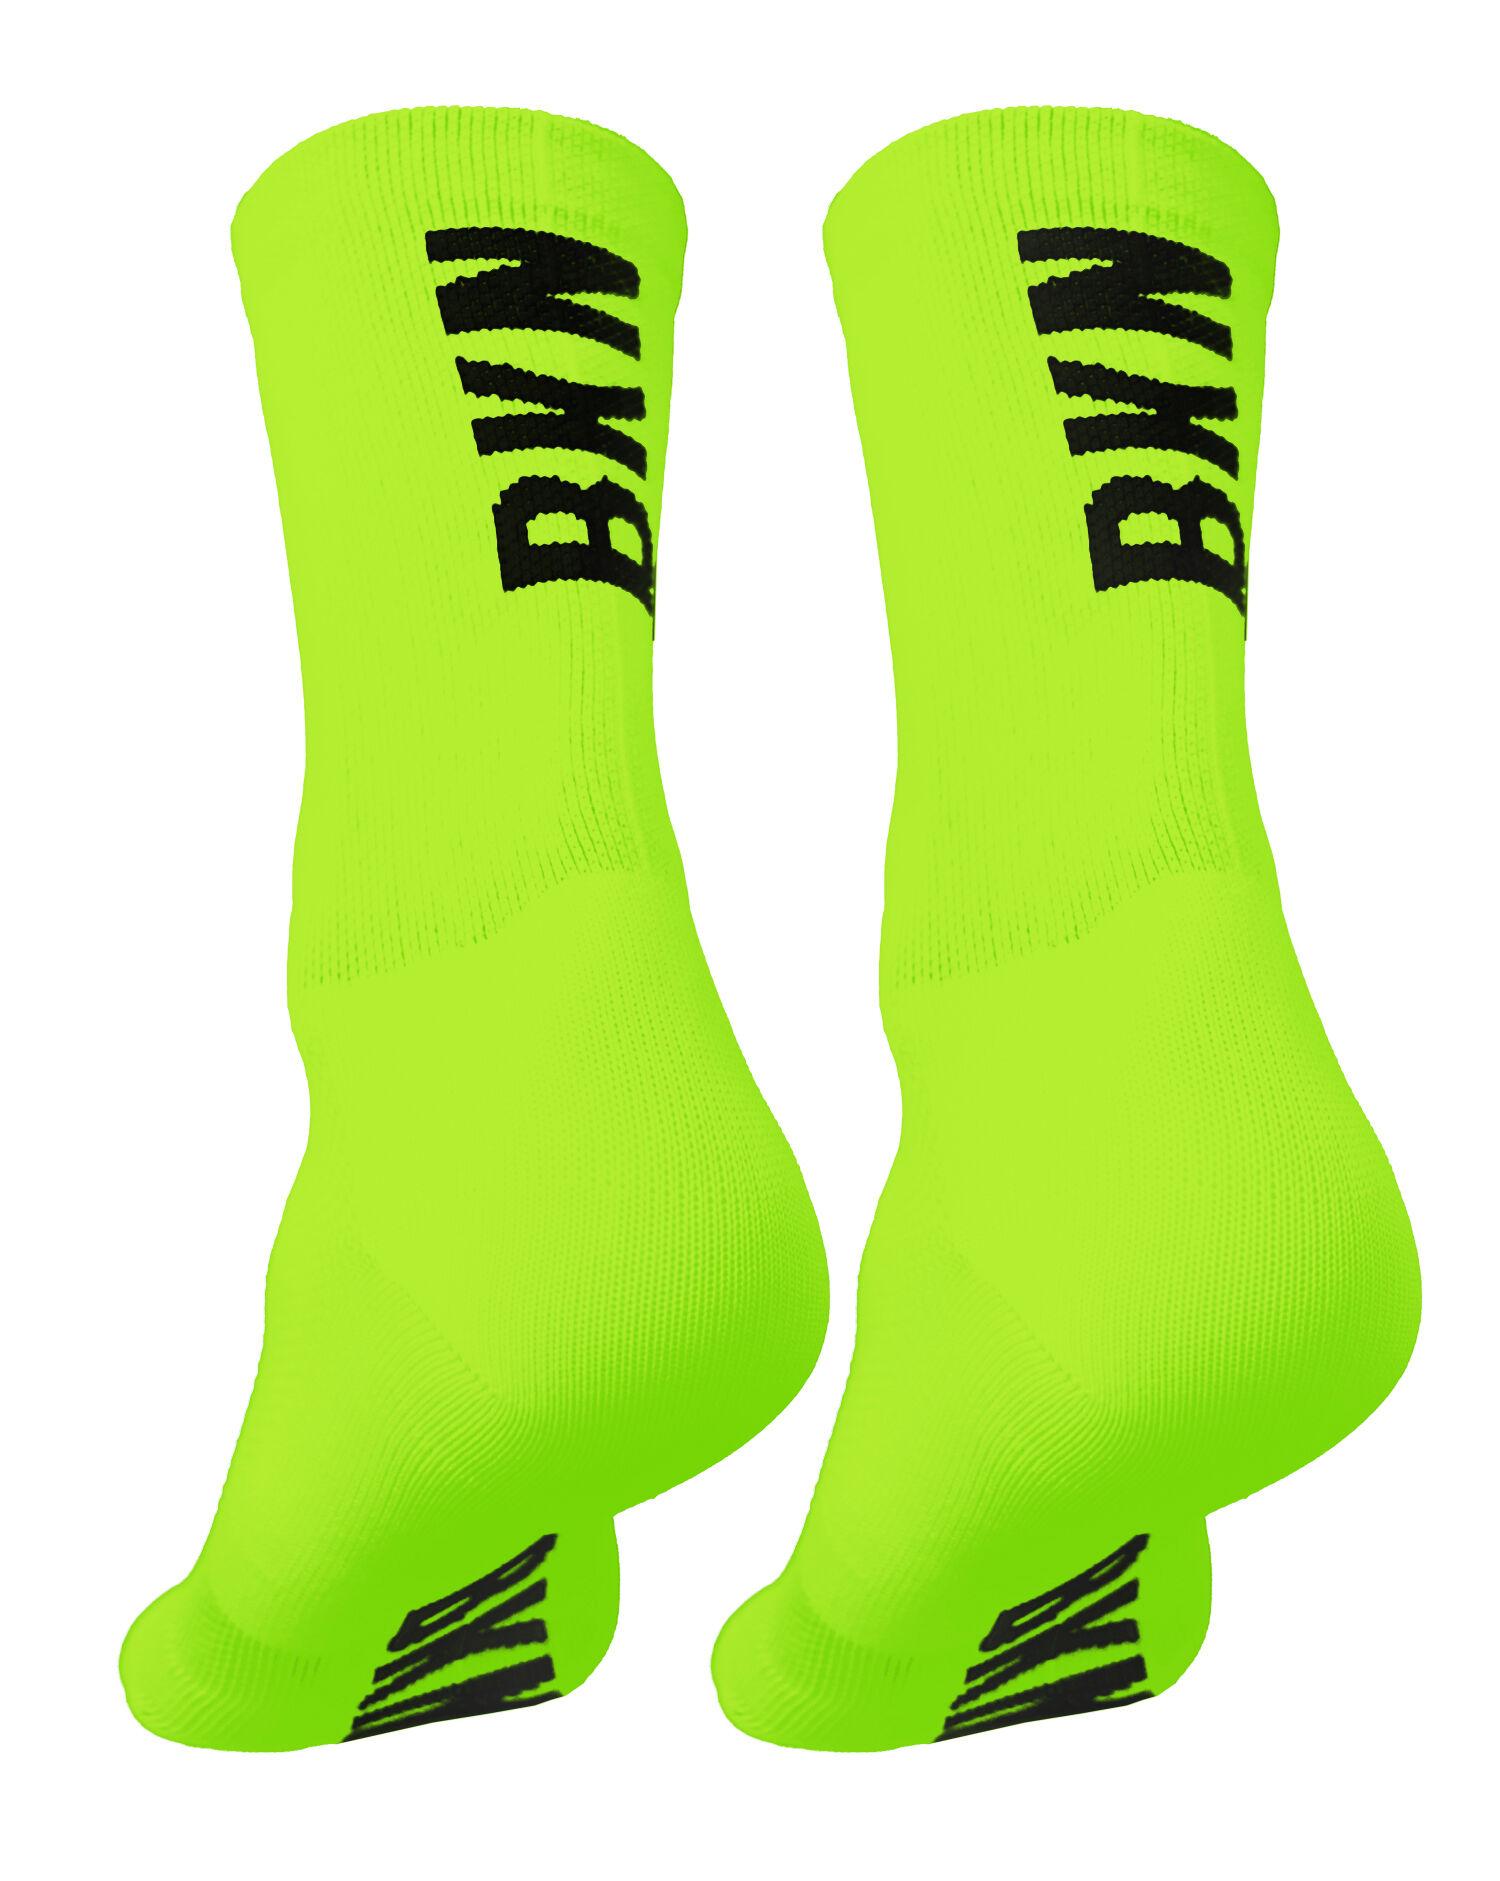 BKN Solid Fluro GREEN Socks